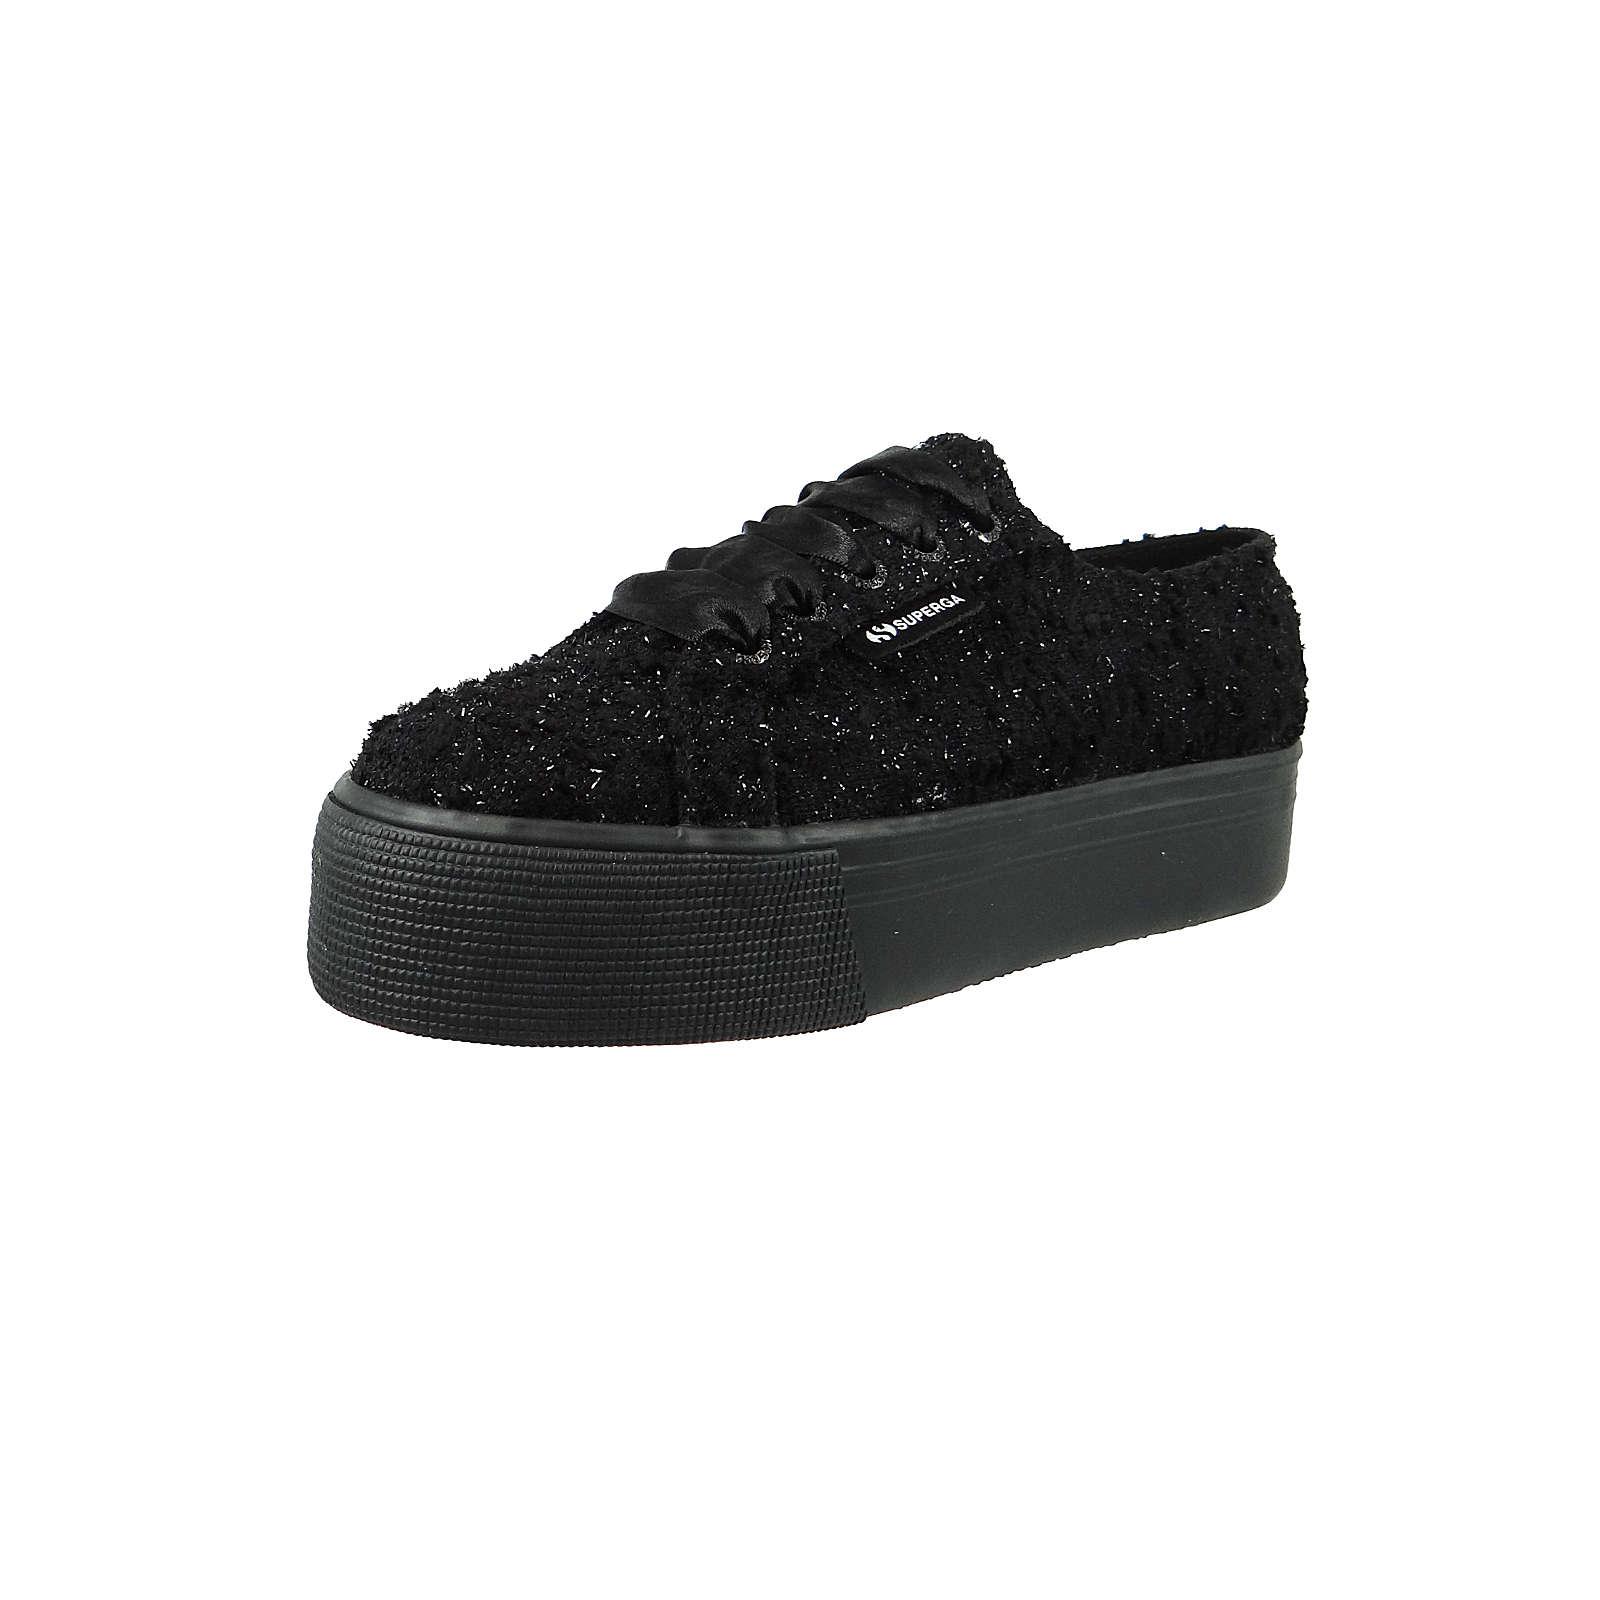 42116d792827f0 Superga® Schuhe Sneaker 2790 COTU Plateau Leder Schwarz Boucle black shiny  S00DFZ0 Sneakers Low schwarz